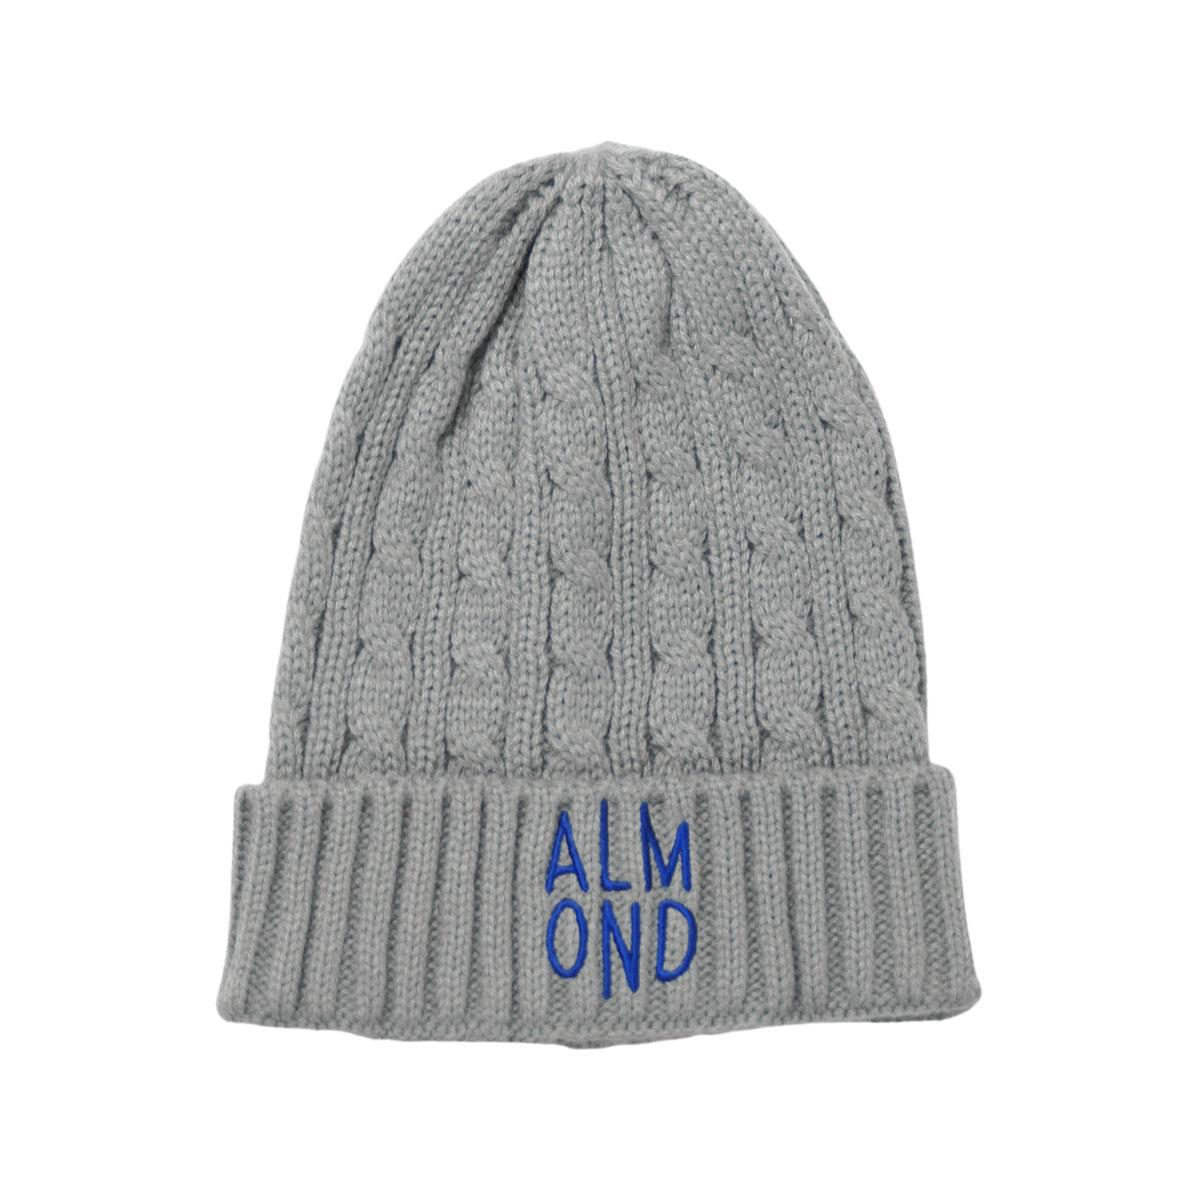 Almond Surf アーモンドサーフボードデザイン KNIT WATCH CAP